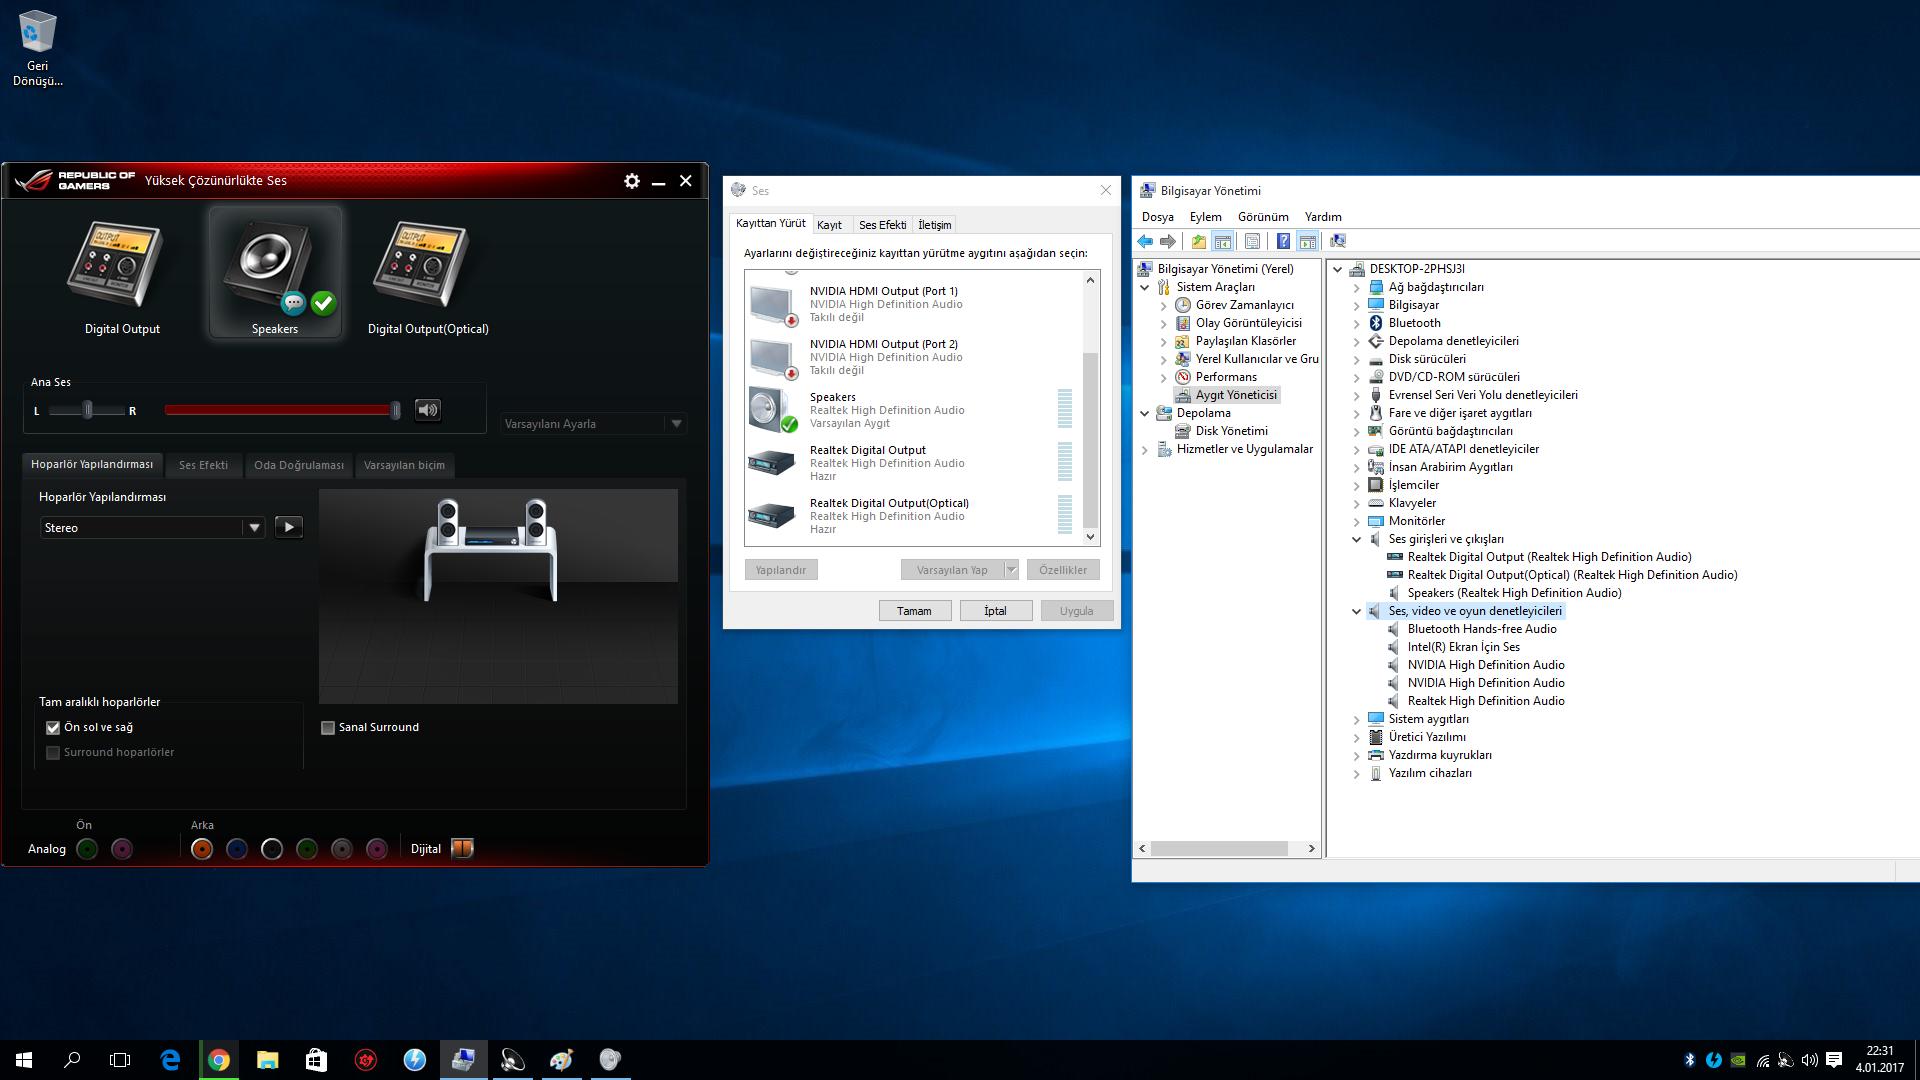 realtek hd audio driver 5.10.0.5121